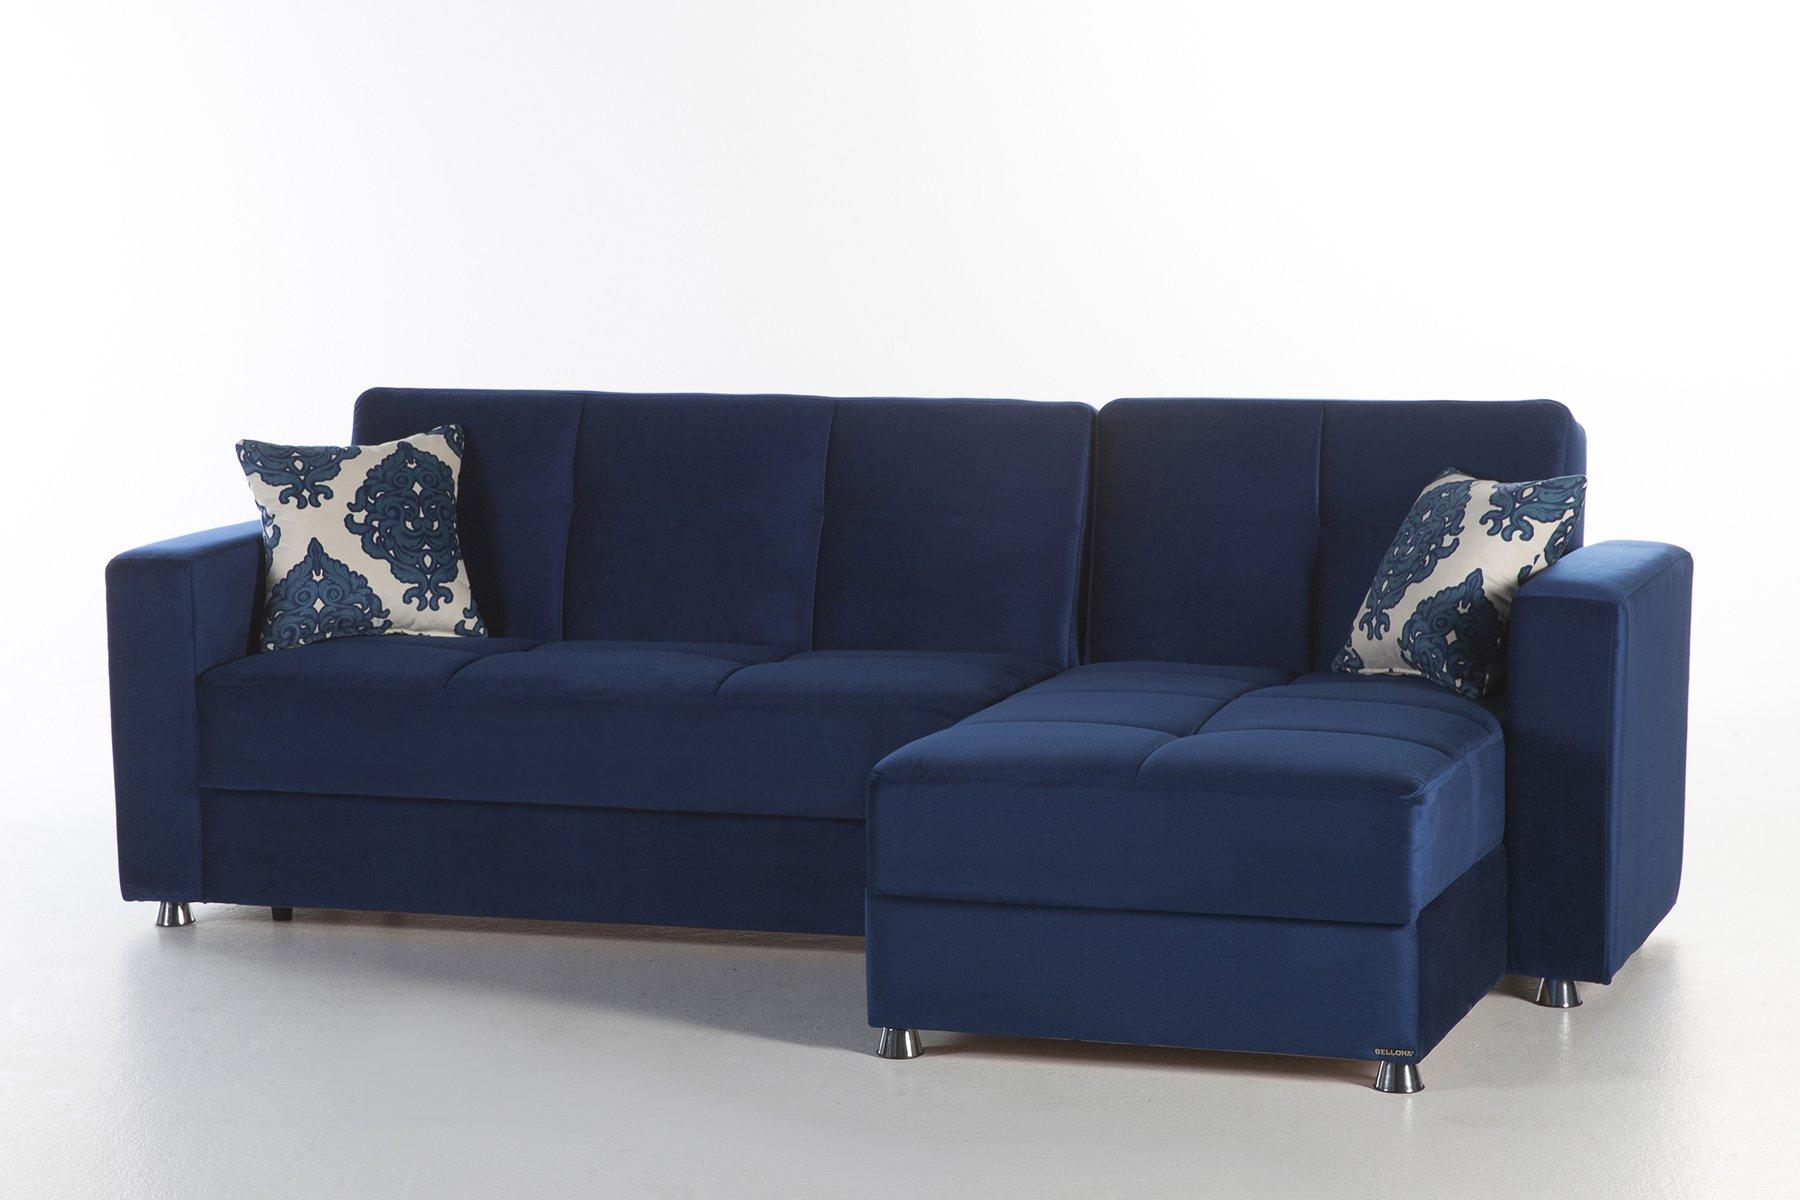 Navy Sofa Aspire Sofa Navy Levin Furniture Thesofa